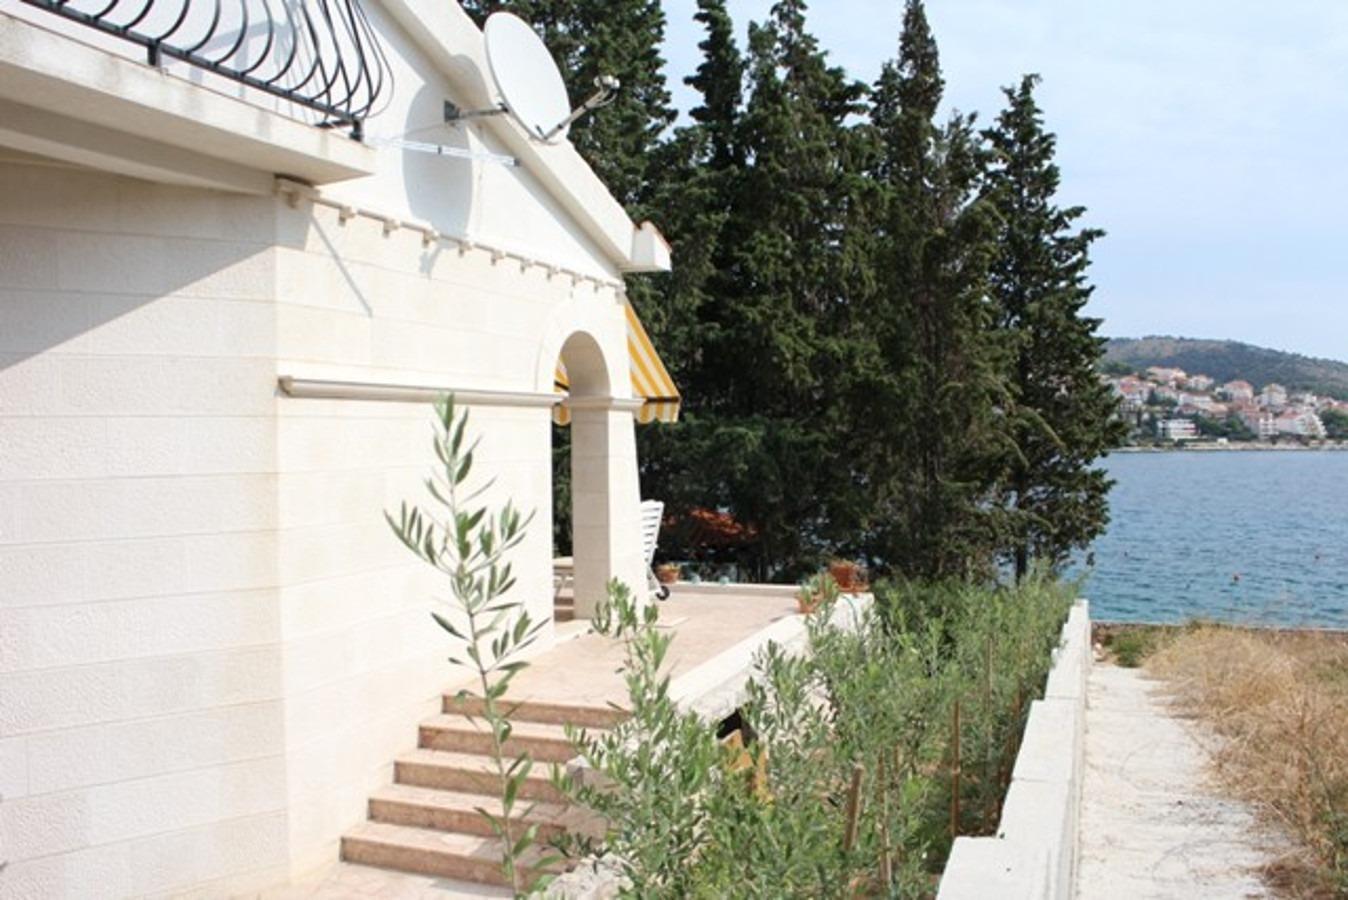 Holiday Homes, Okrug Gornji, Island of Čiovo - Holiday houses, villas  Varija